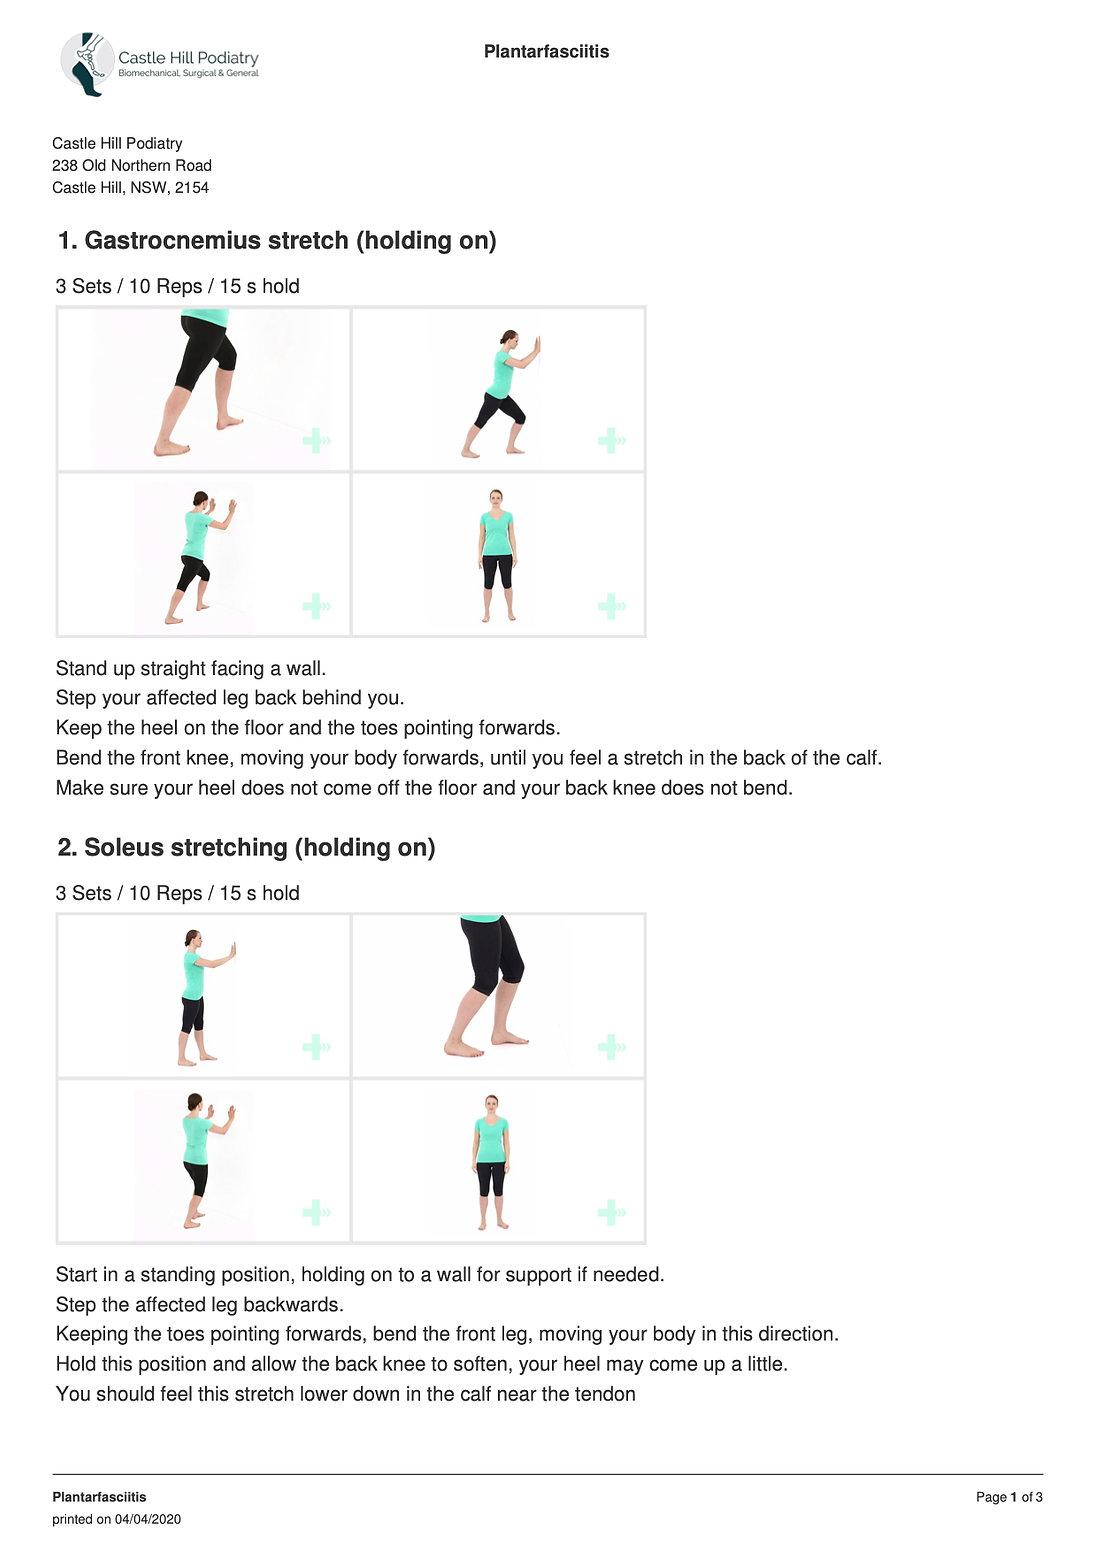 Plantarfasiitis exercise.jpg